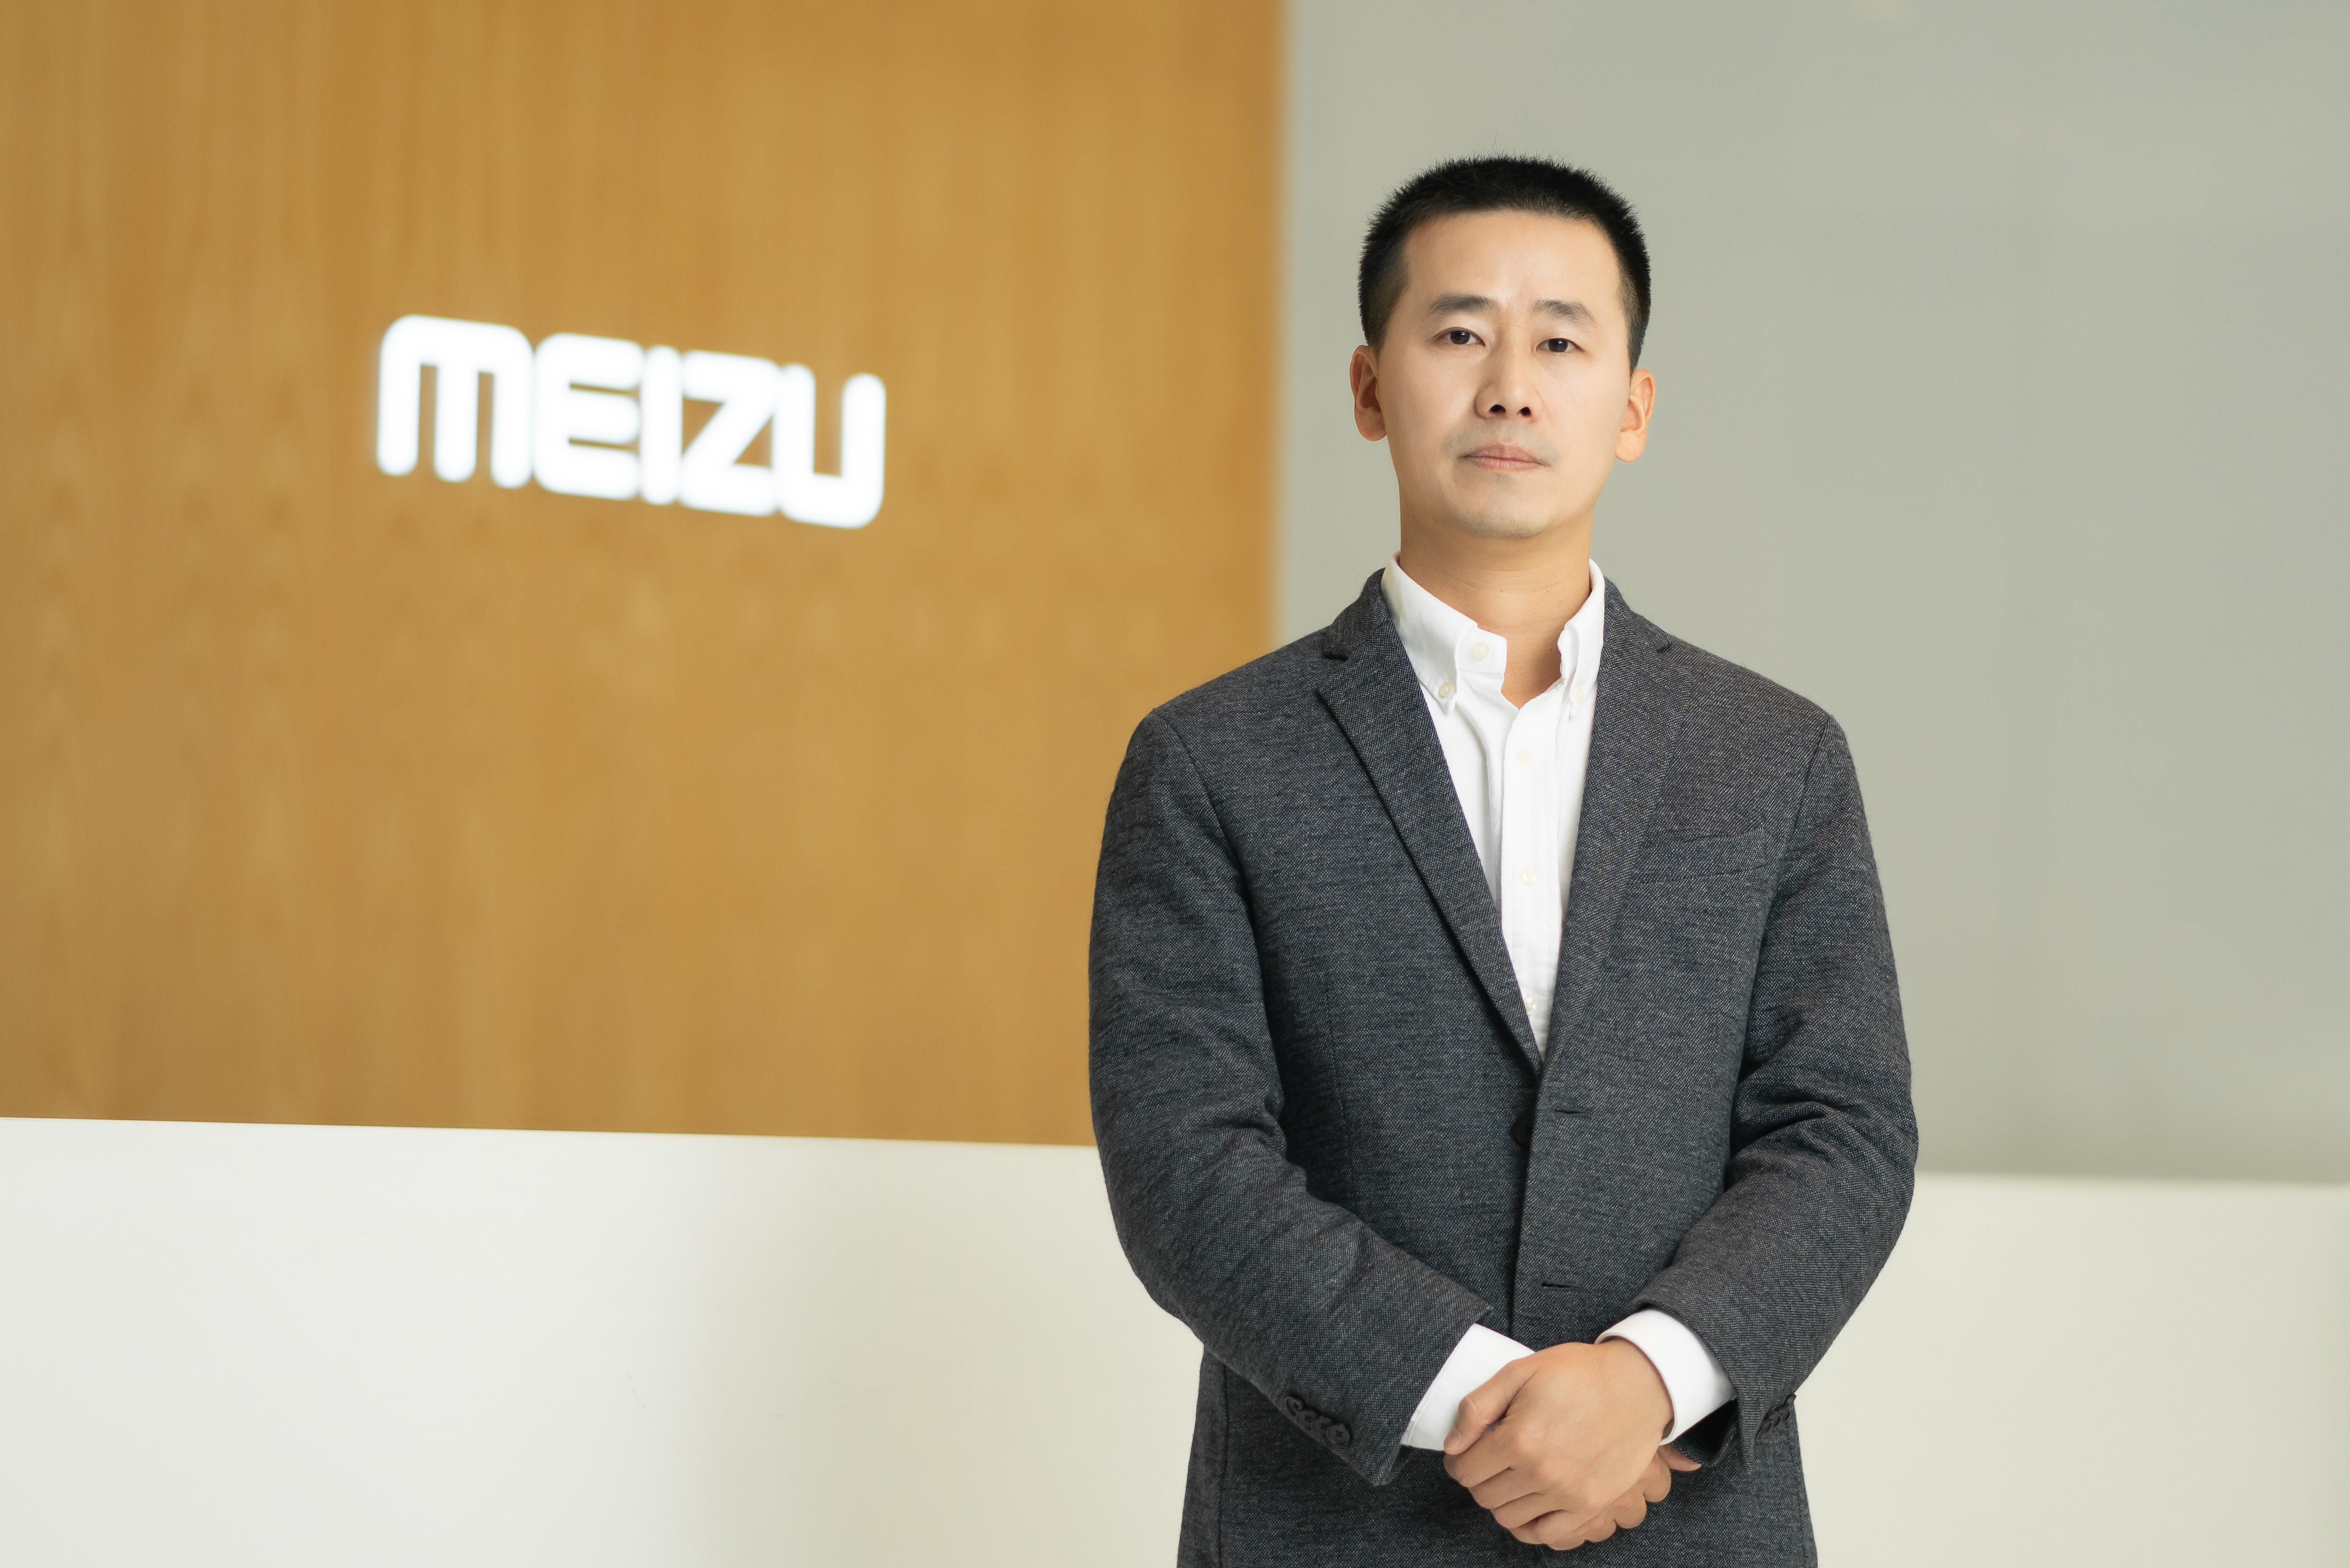 MEIZU CEOの交代が明らかに、黄質潘(Huang Zhipan)氏が就任